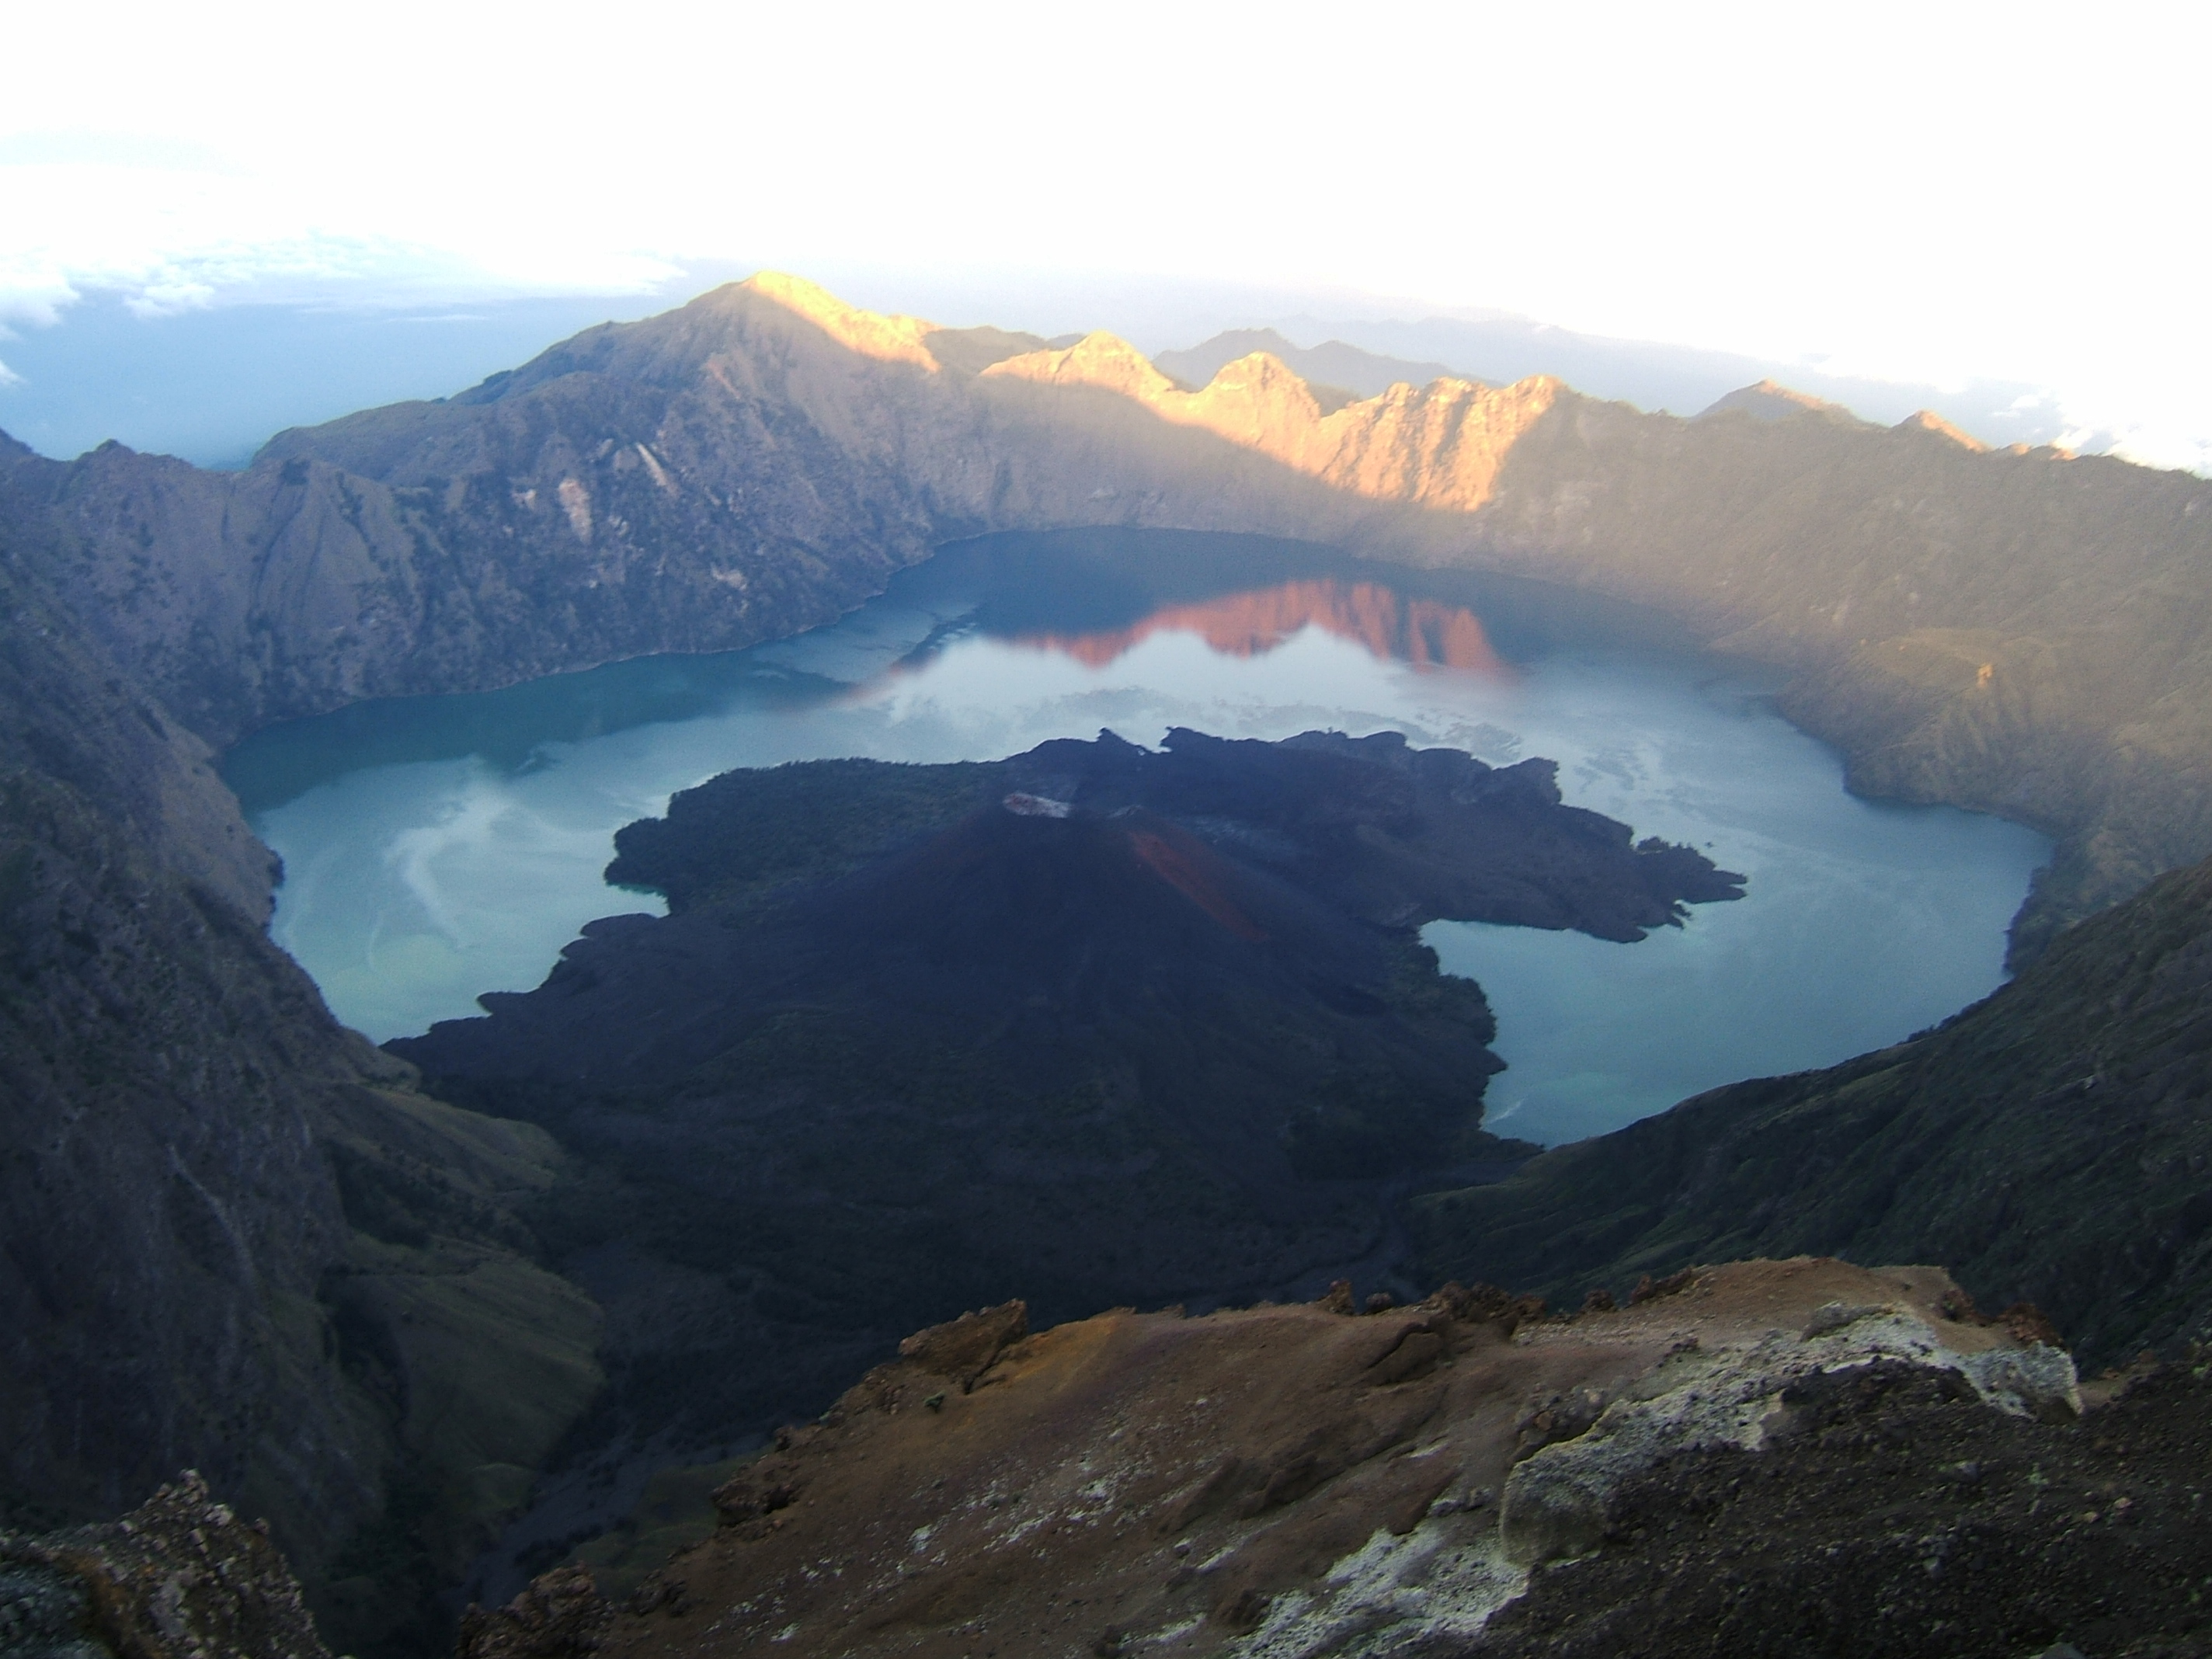 File:Rinjani Volcano, Lombok.JPG - Wikimedia Commons